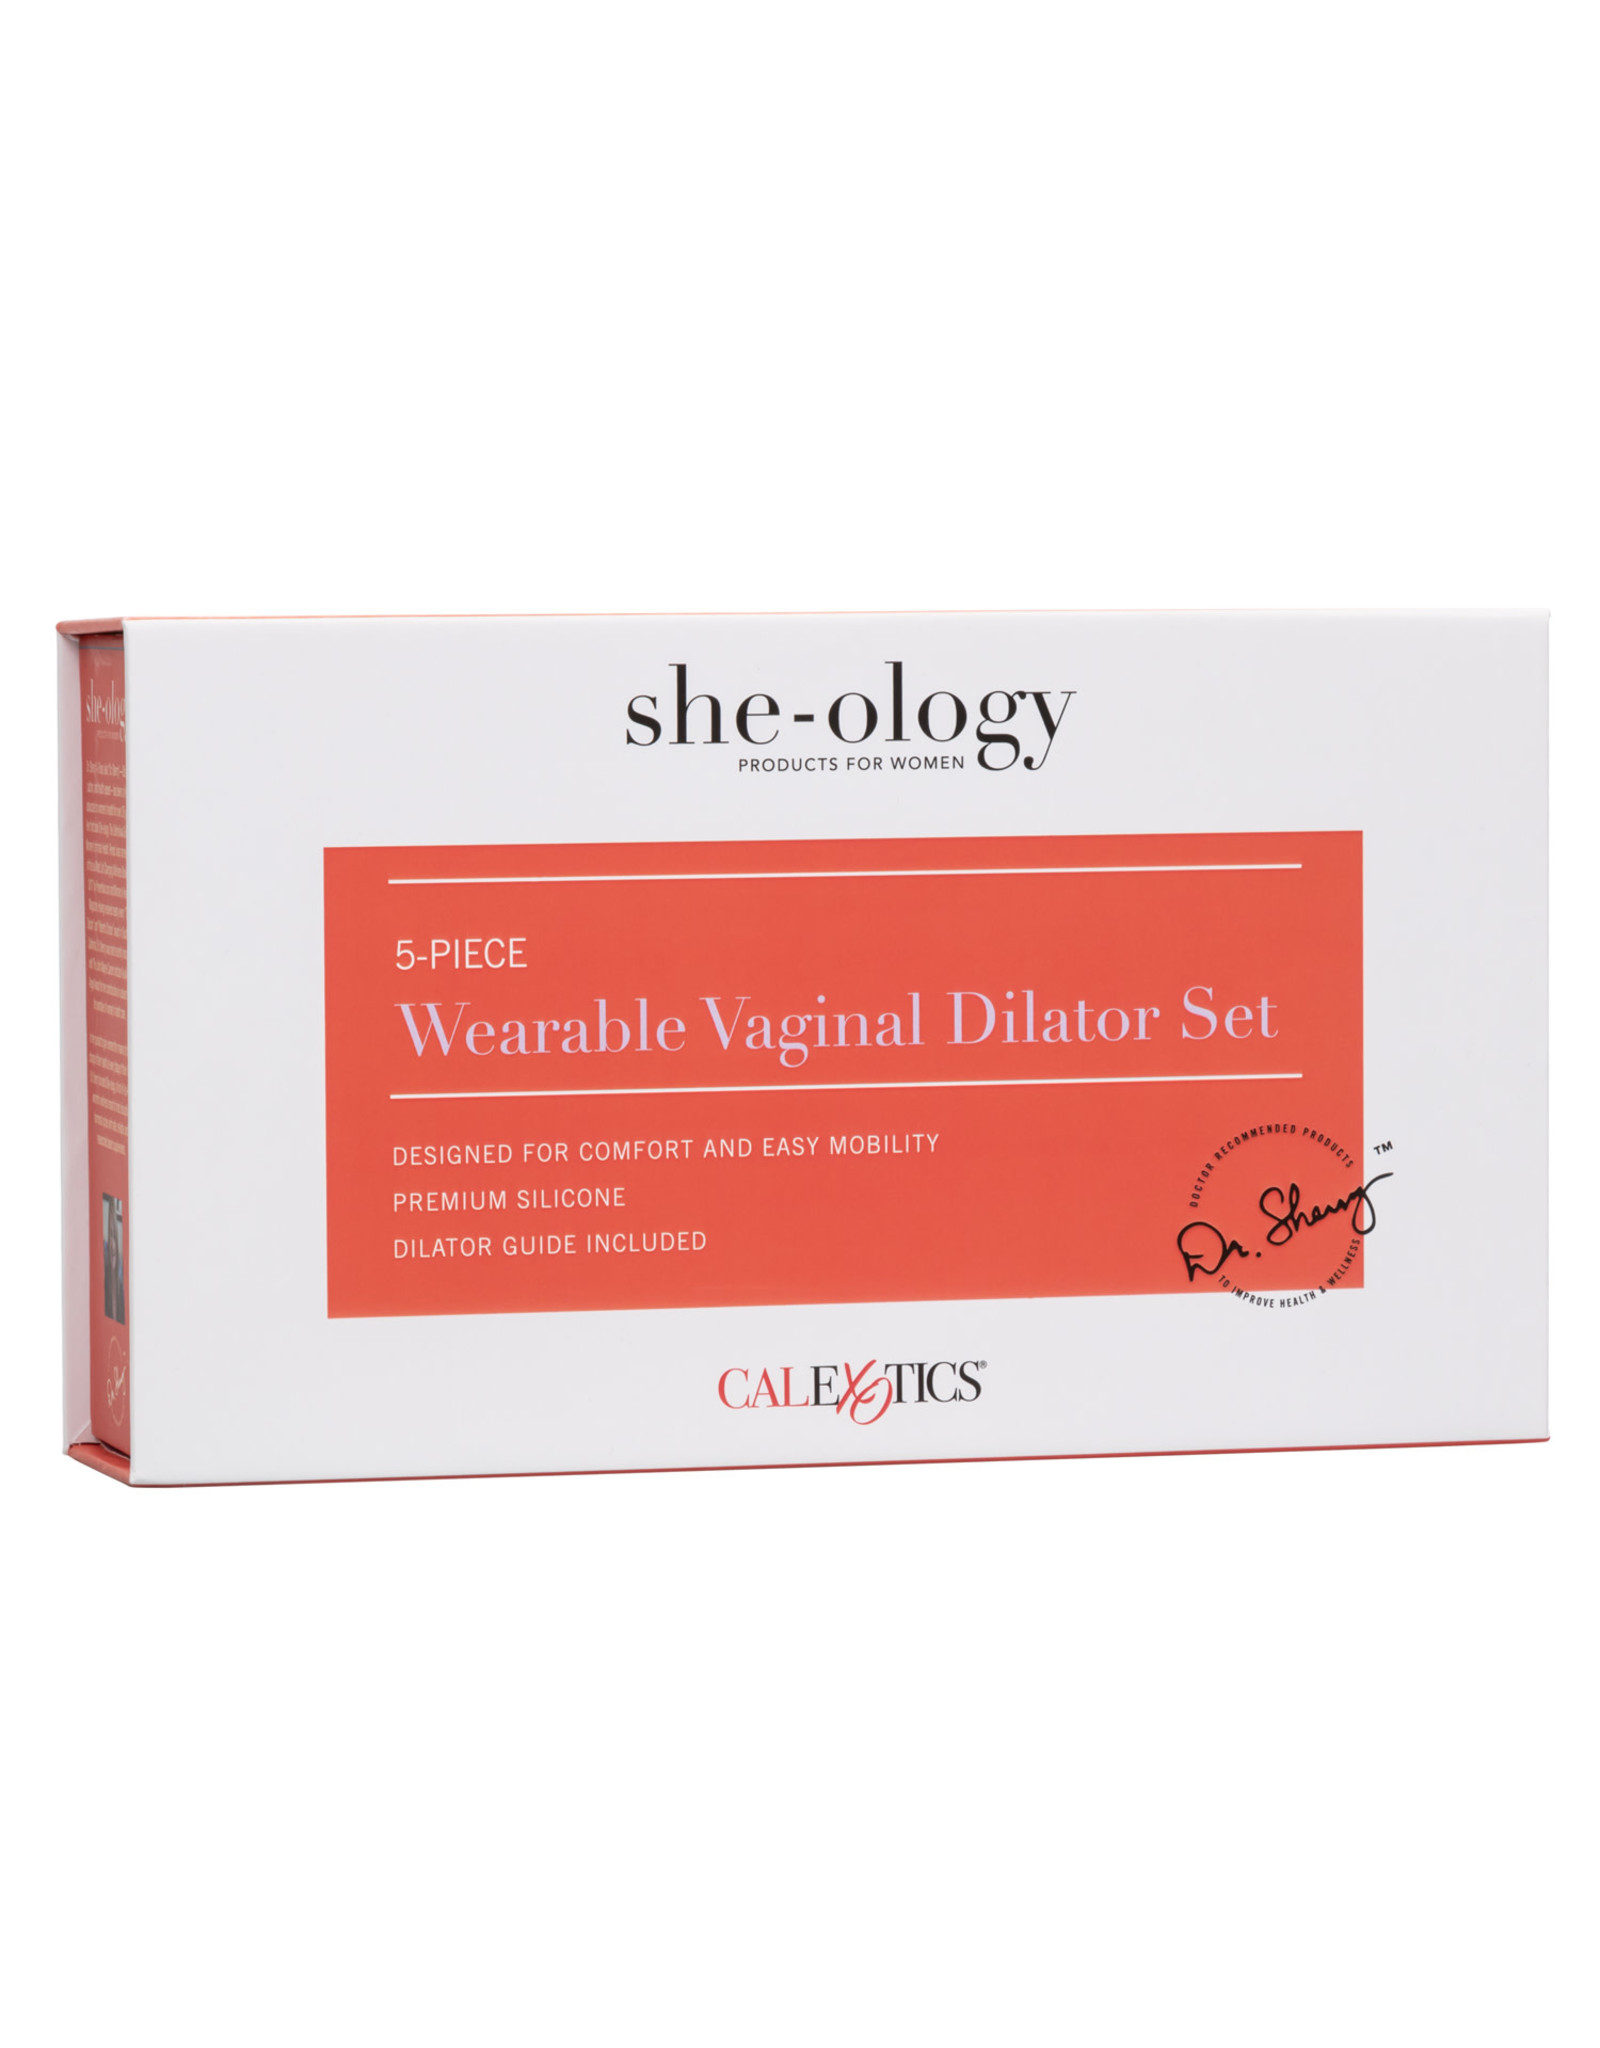 Calexotics She-ology 5 Piece Wearable Vaginal Dilator Set